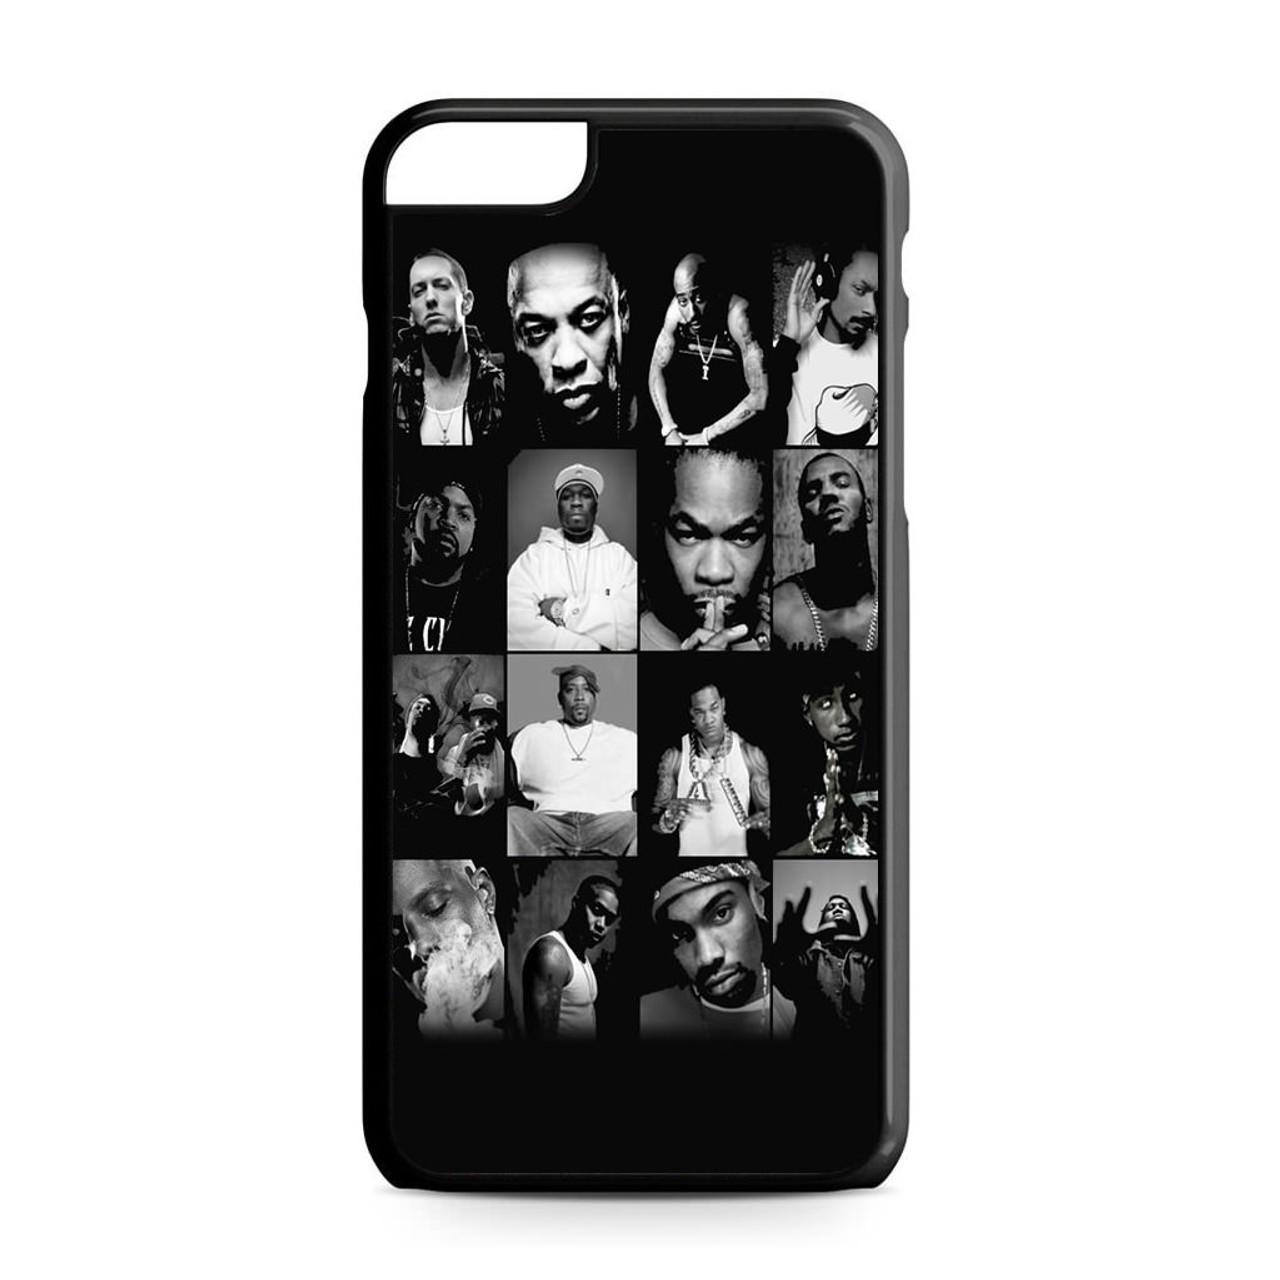 e7851d0b1f6 Eminem, Dr. Dre, Xzibit All Rapper Hero iPhone 6 Plus/6S Plus Case -  CASESHUNTER